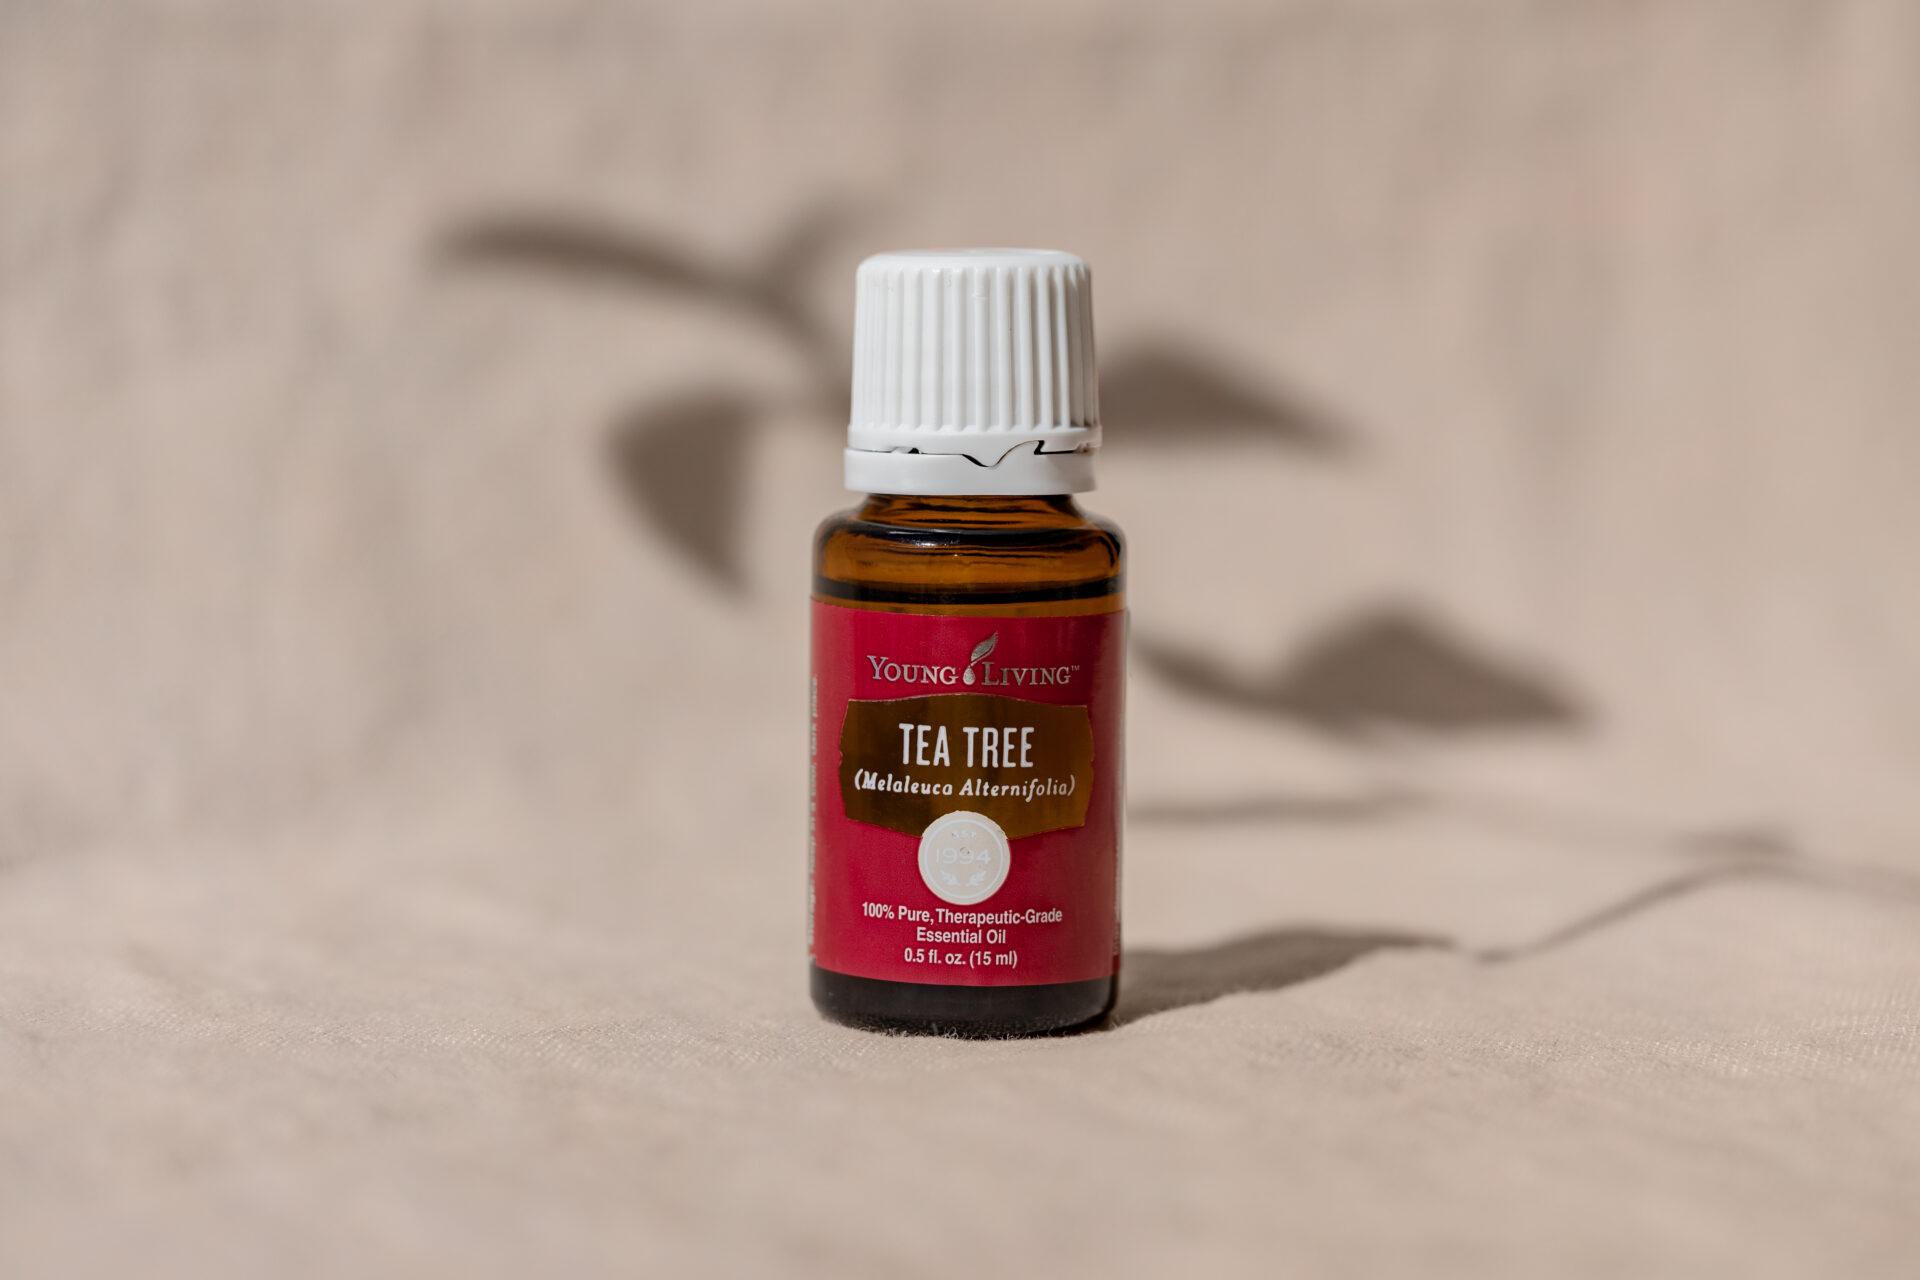 Tea Tree Essential Oil - Young Living Essential Oils